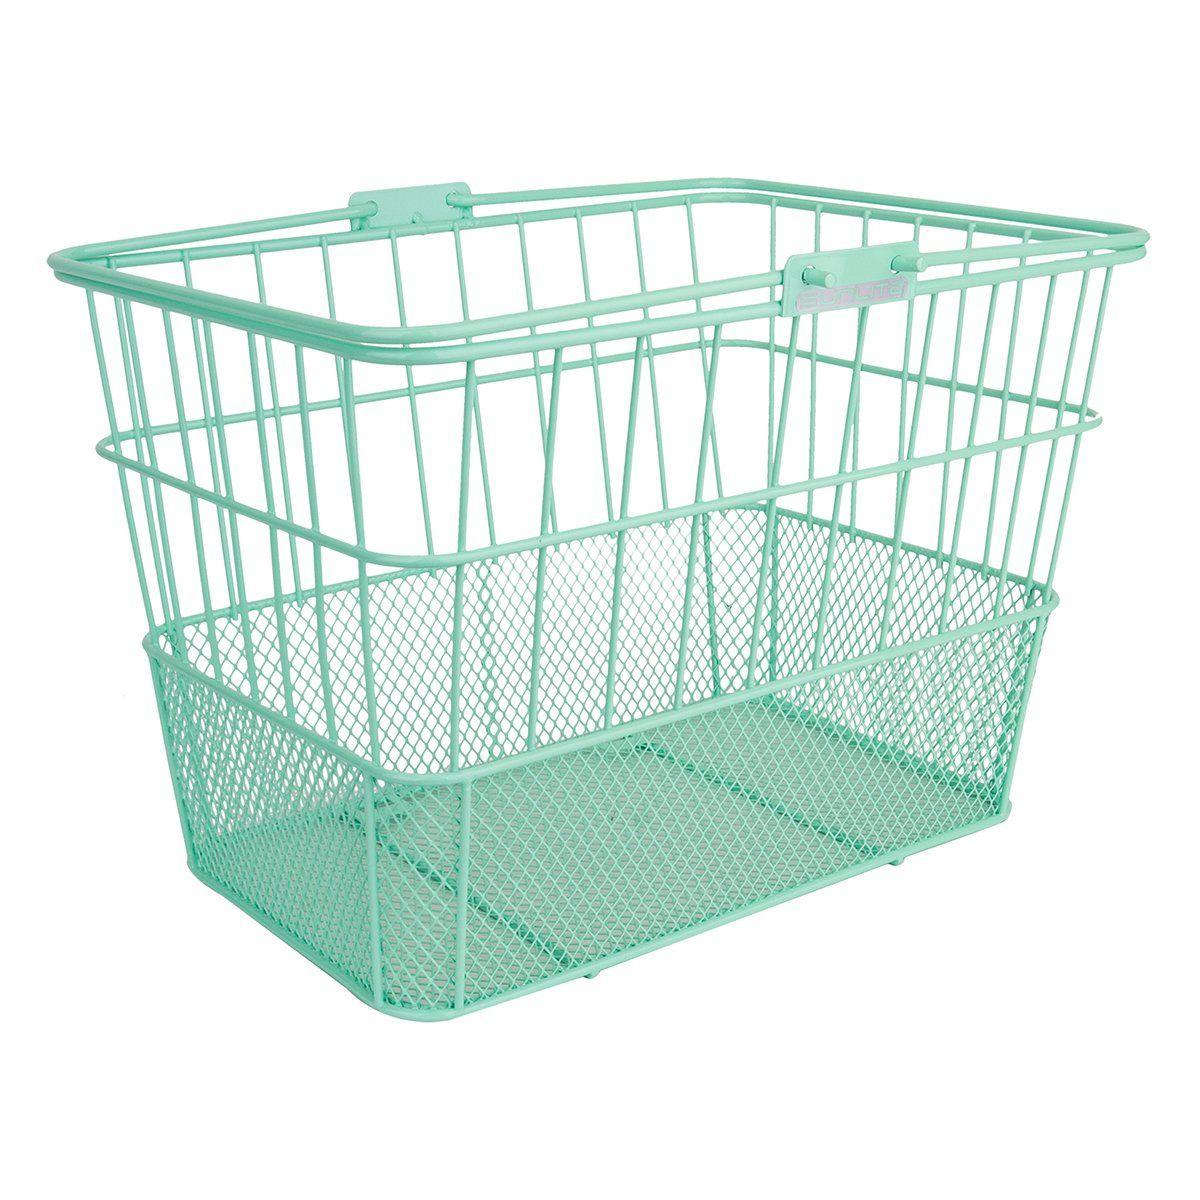 Amazon.com : Sunlite Standard Mesh Bottom Lift-Off Basket - Green ...